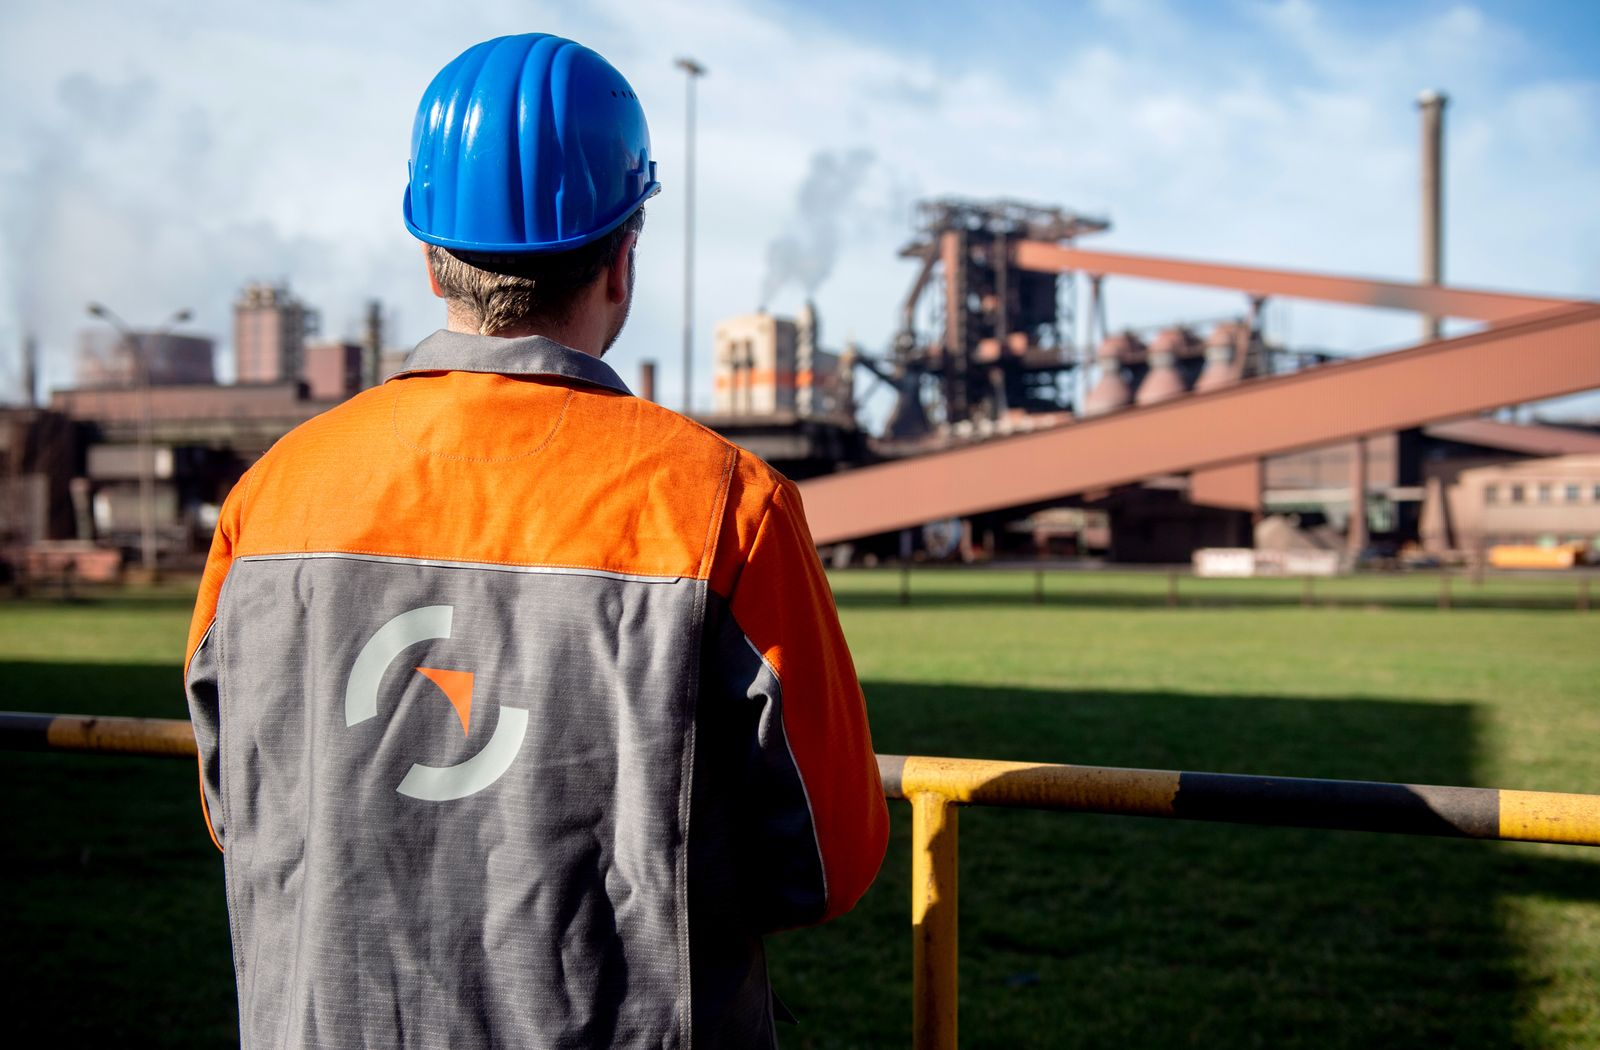 Salzgitter AG verringert Produktion und prüft Kurzarbeit